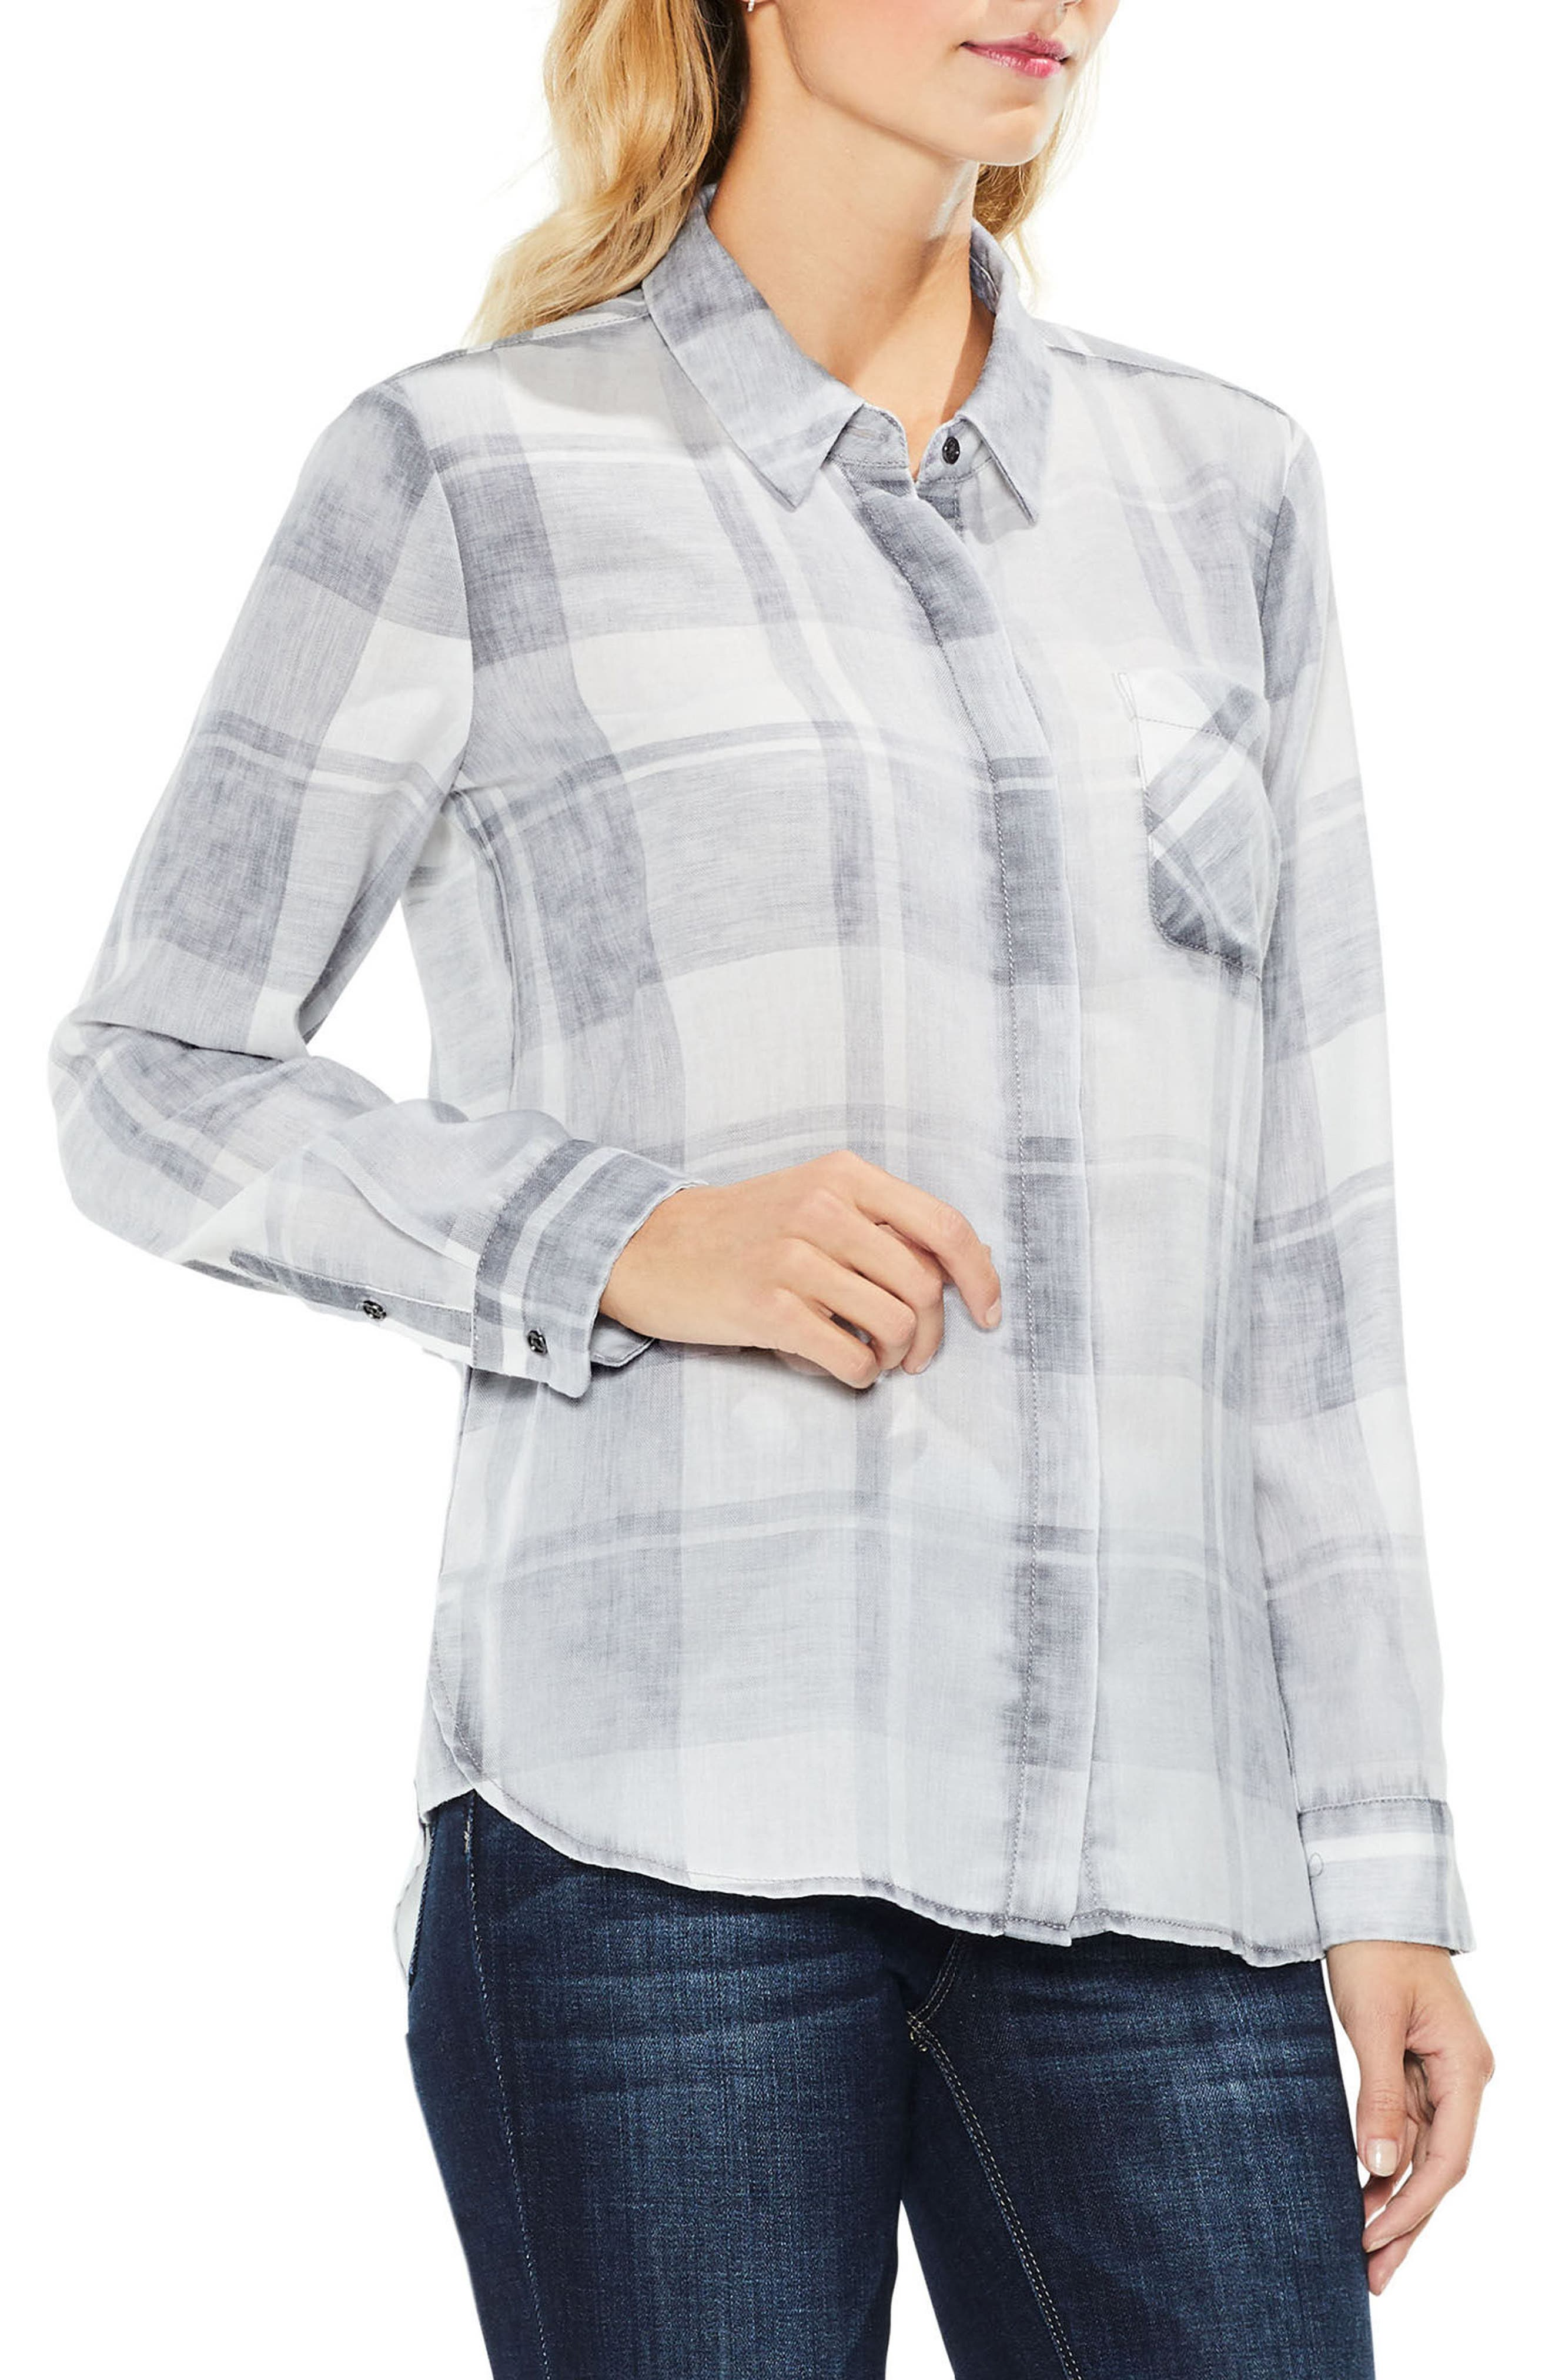 Quaint Plaid Button Down Shirt,                             Main thumbnail 1, color,                             Grey Heather